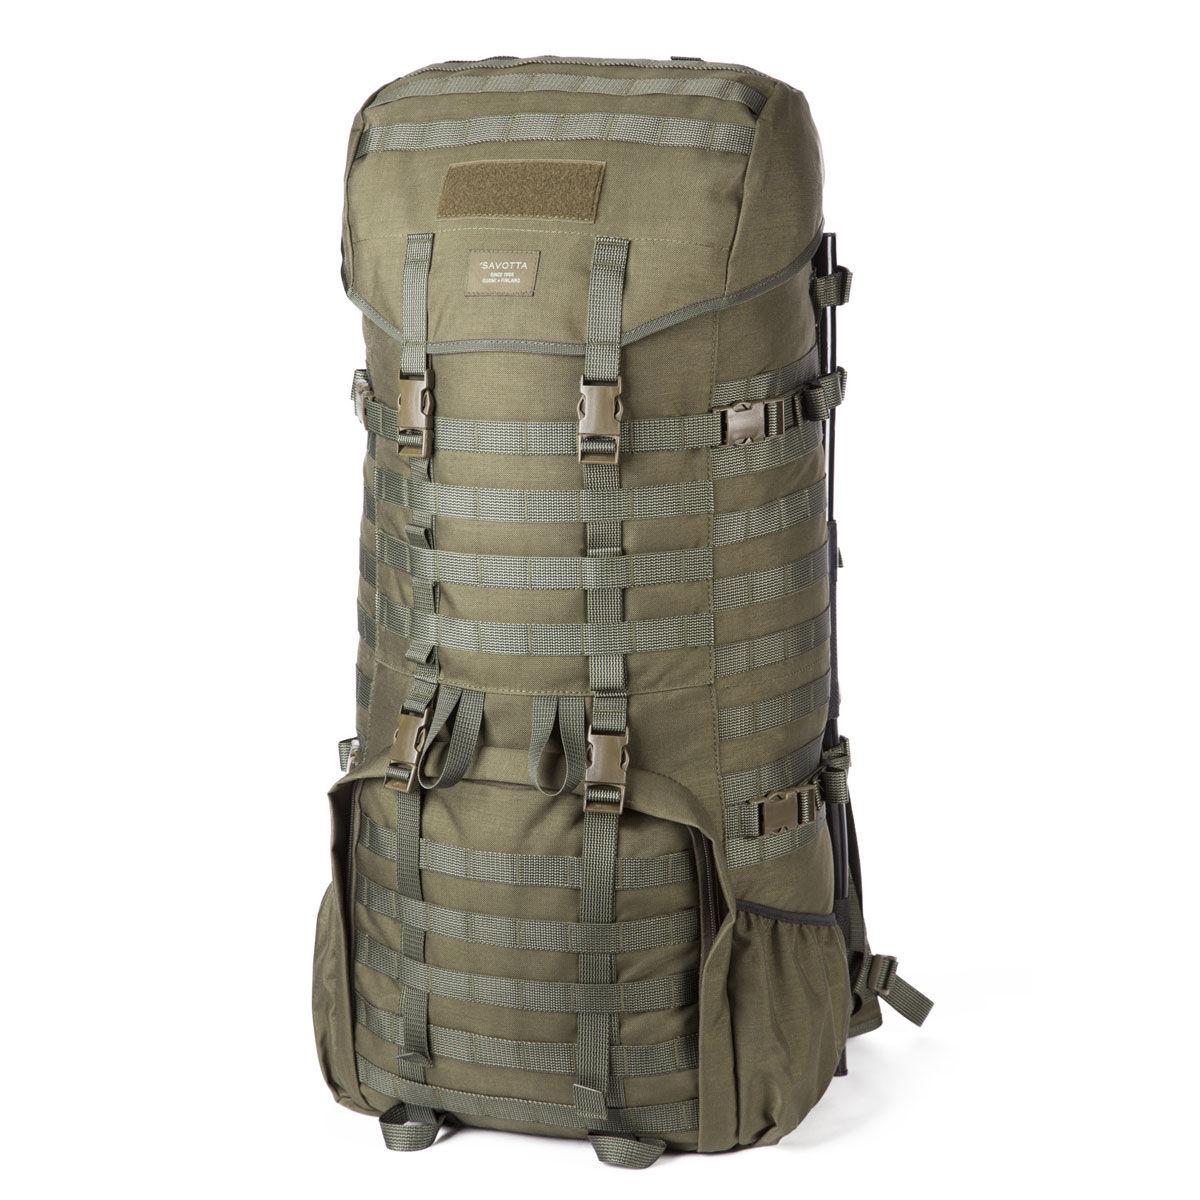 Savotta Jääkäri XL 70 litre Backpack  - Olive Green